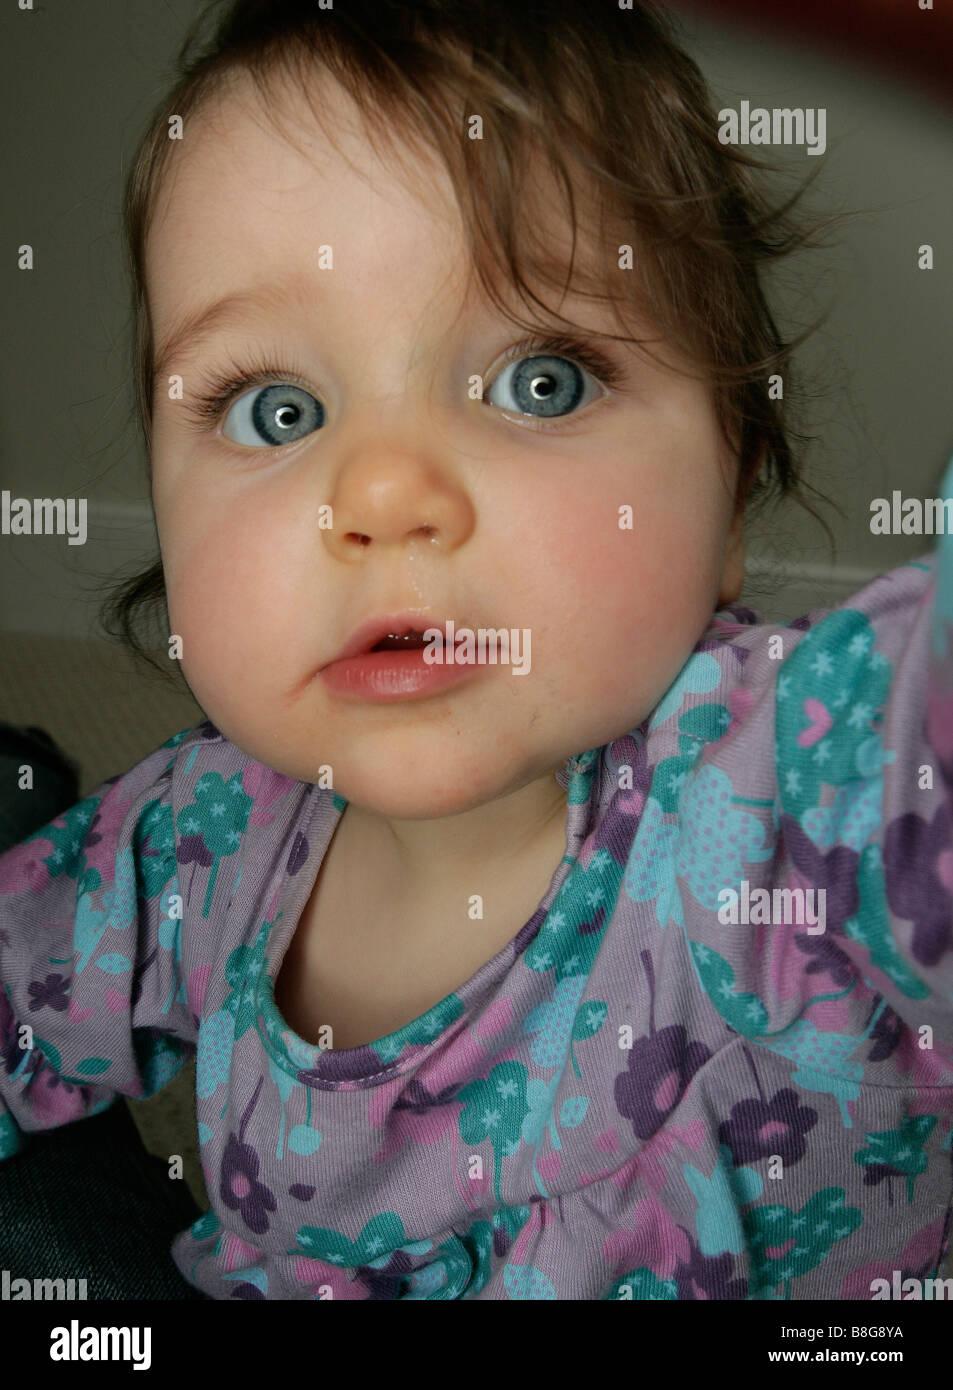 group of baby girl blue eyes